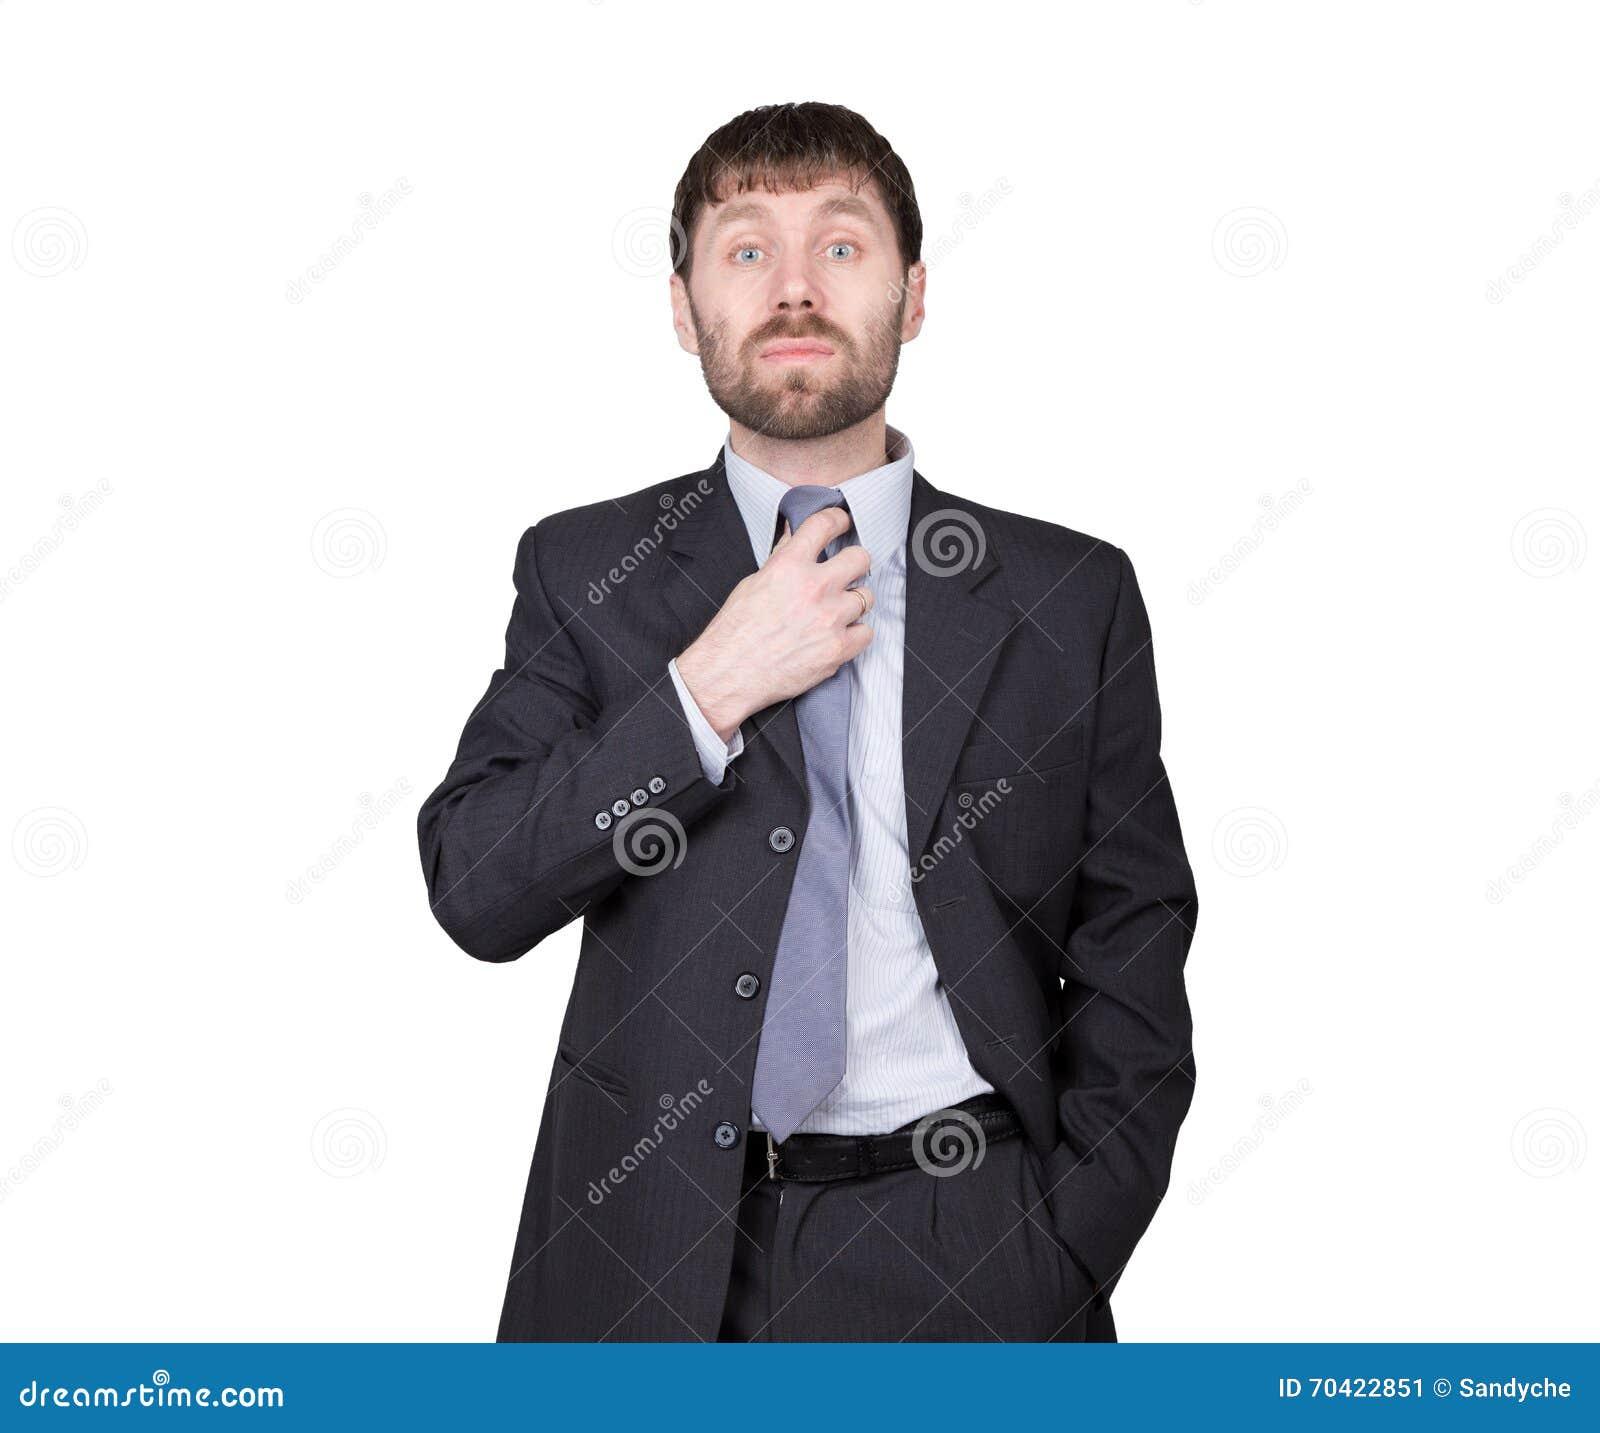 Gestures Distrust Lies. Body Language. Man In Business ...